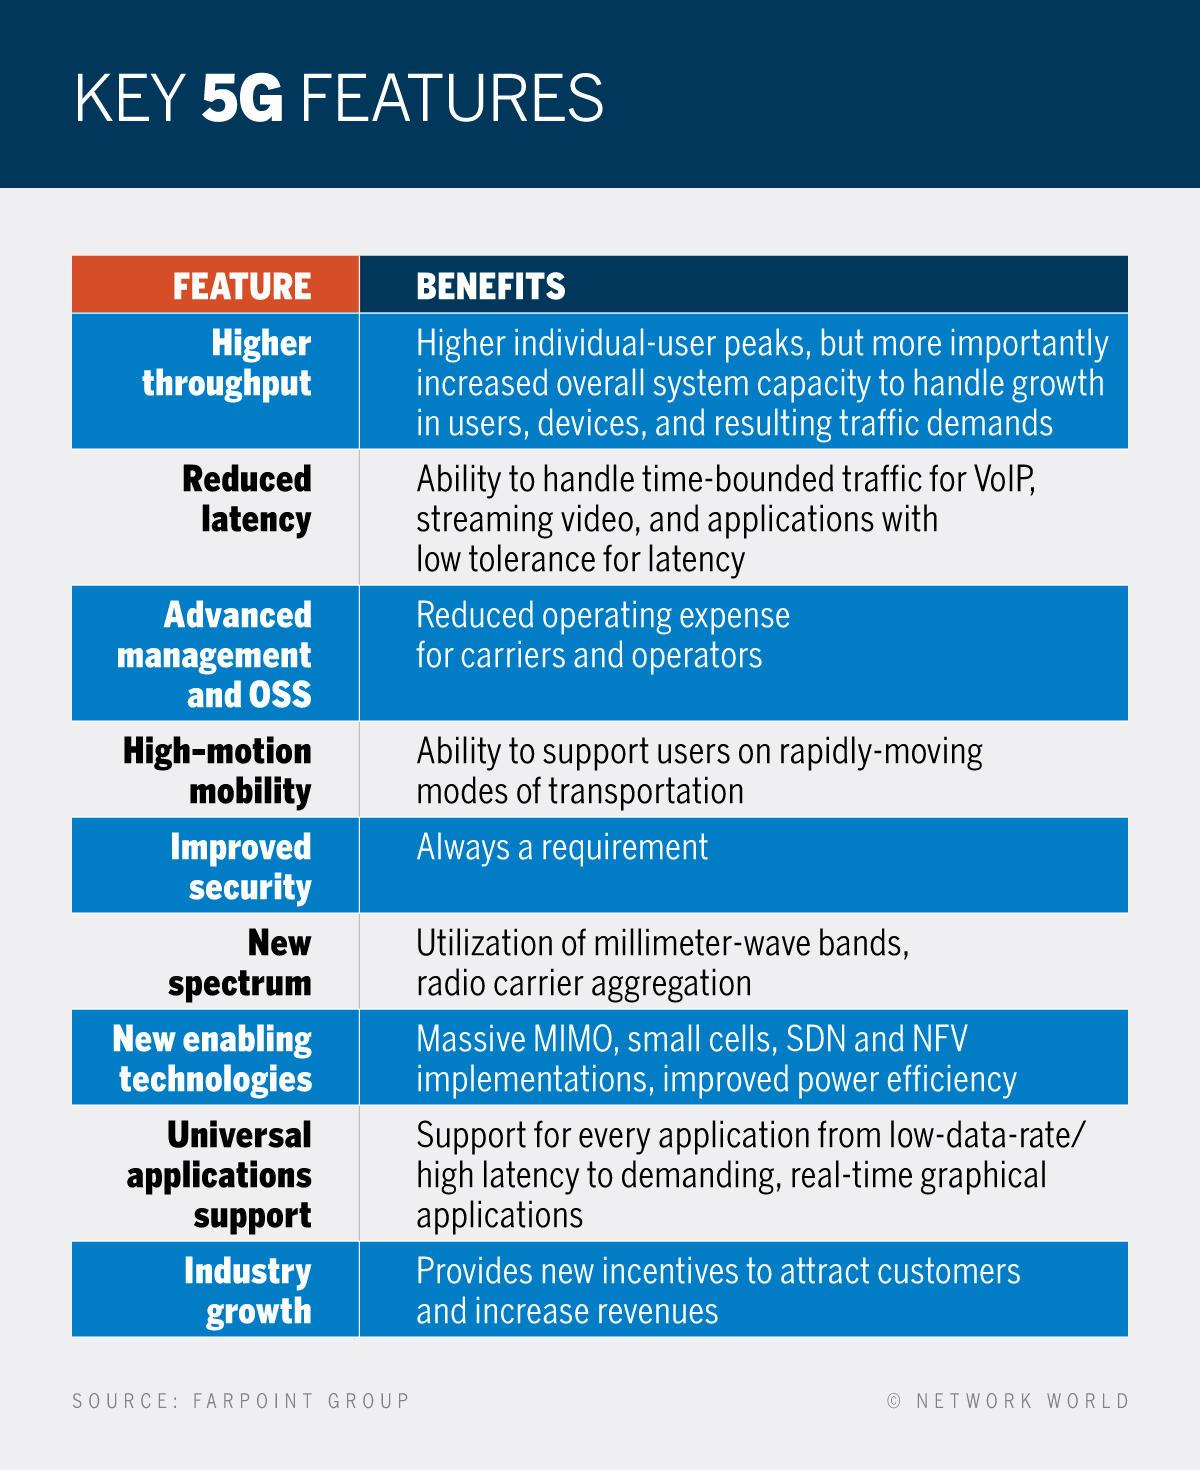 Network World - 5G Wireless - Key Features [2017]